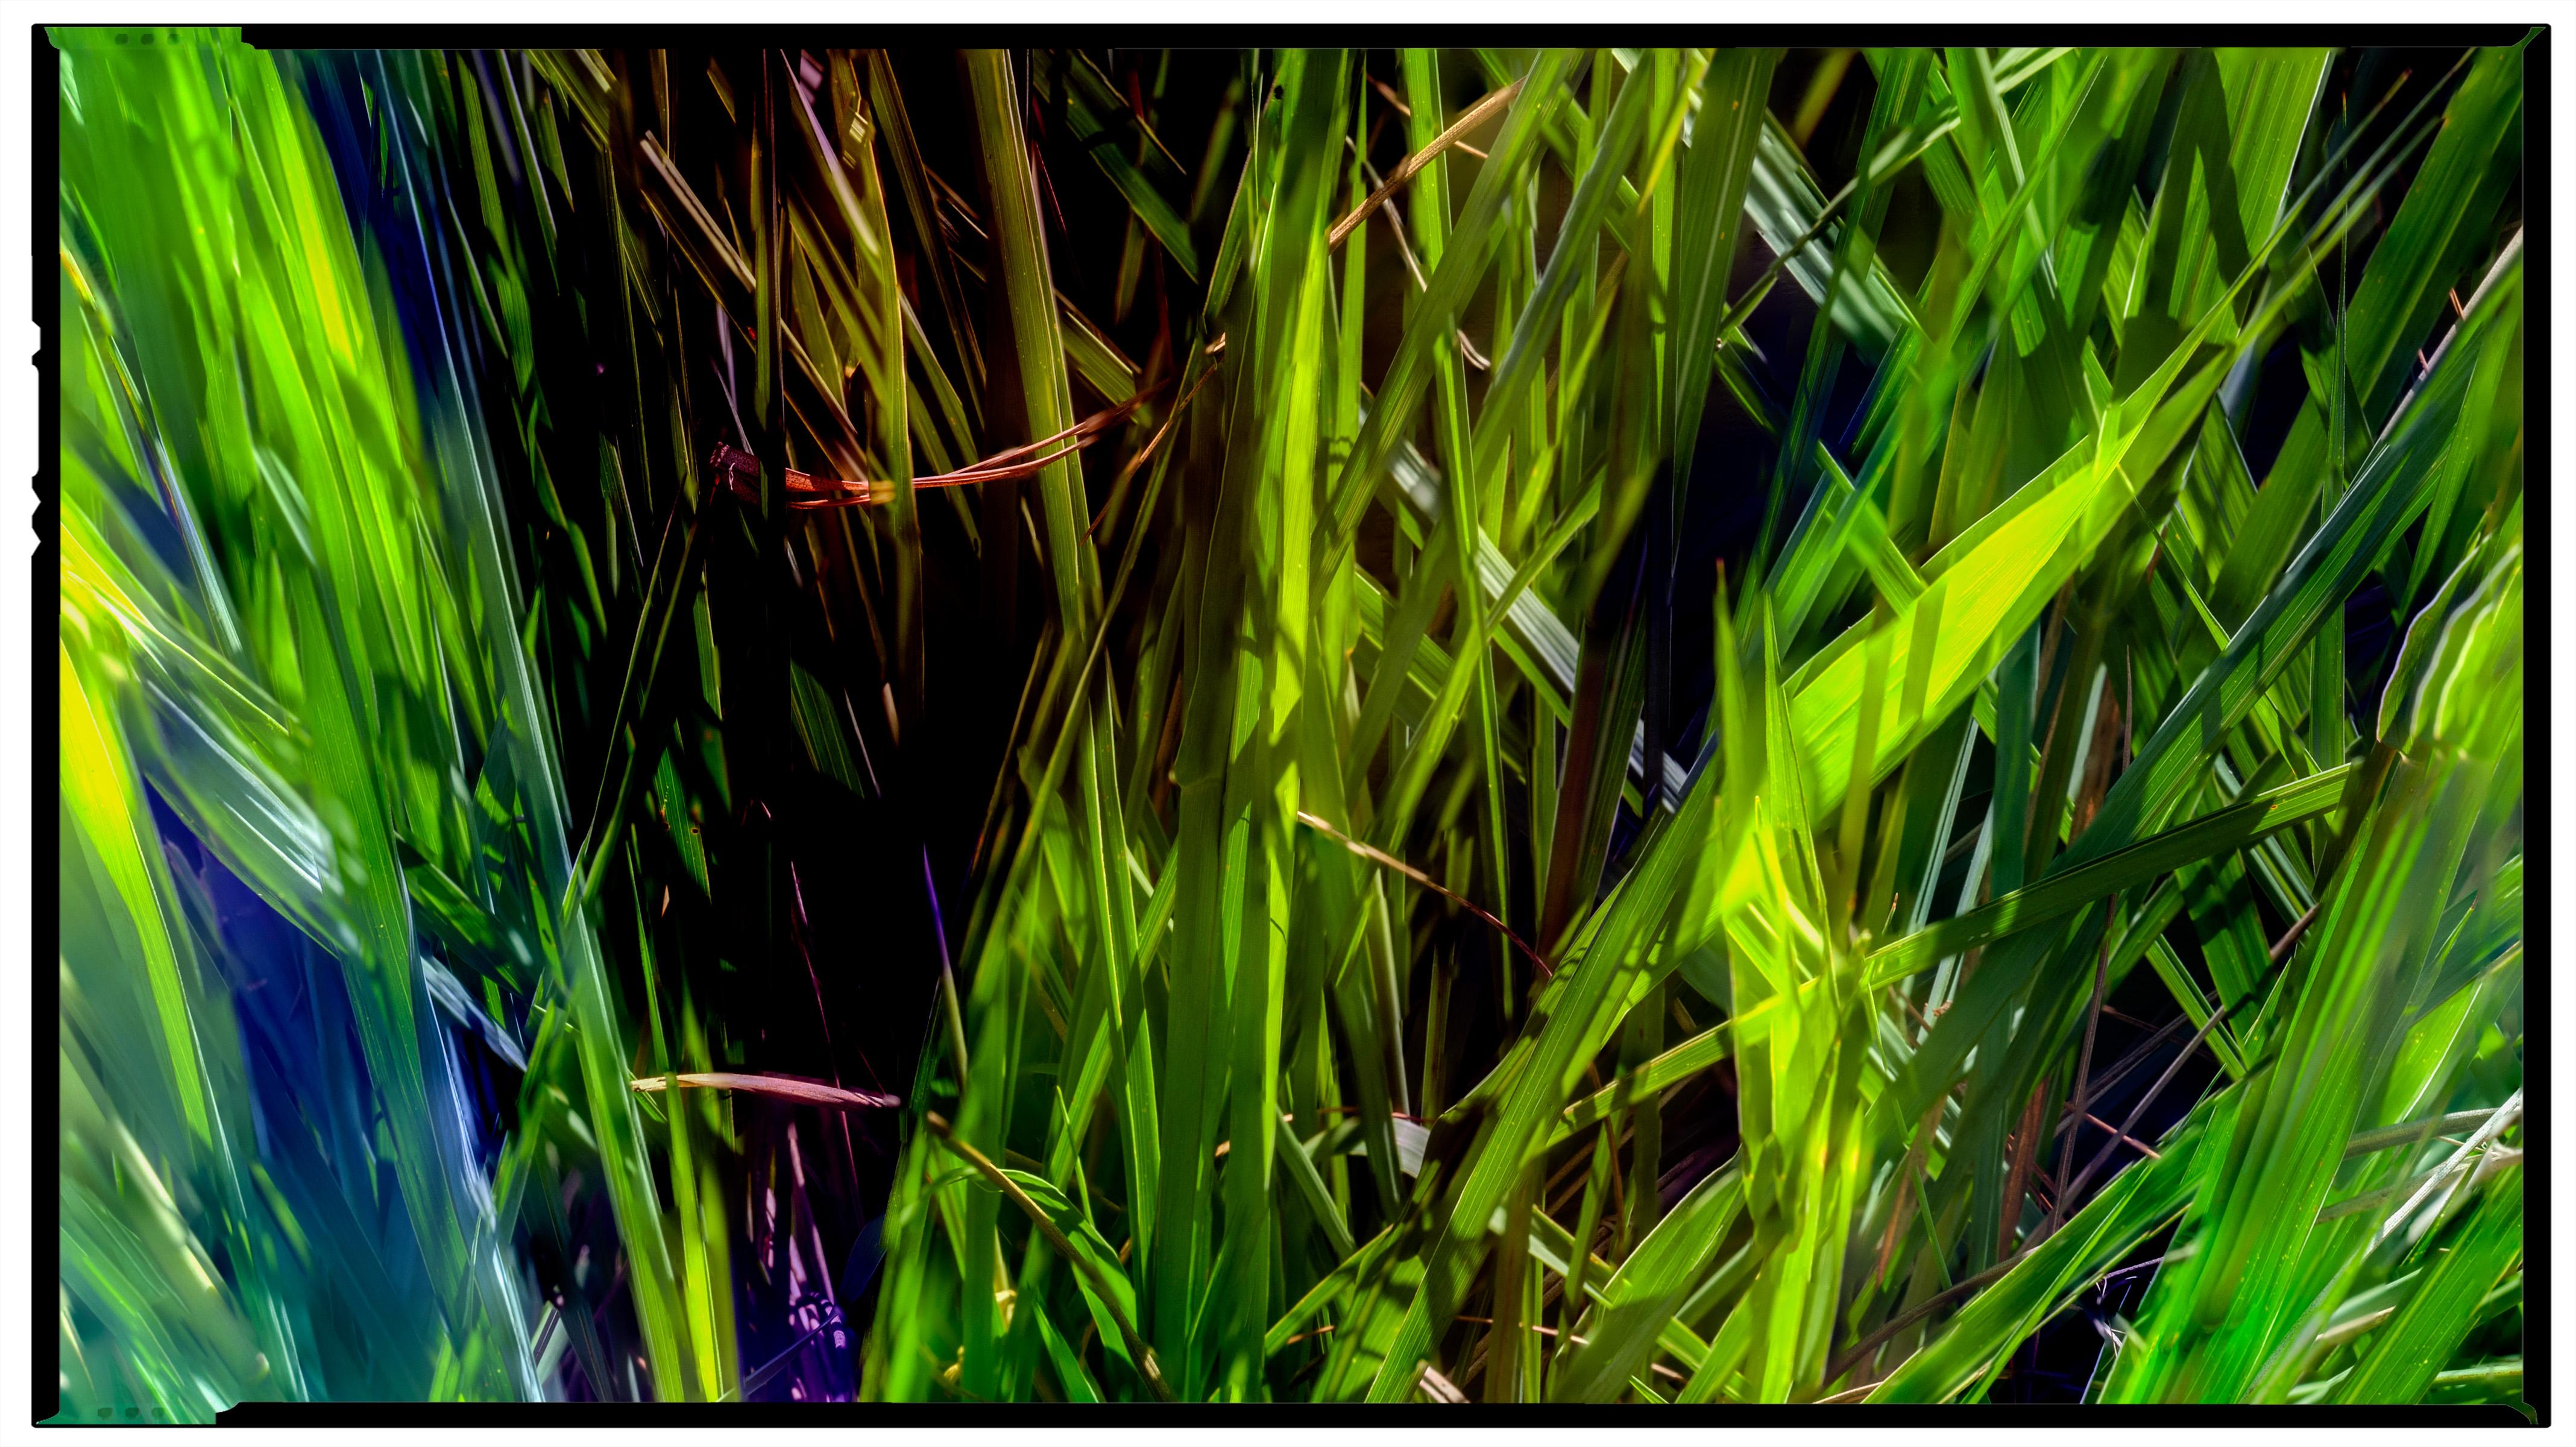 Watercolor Grasses, 2018